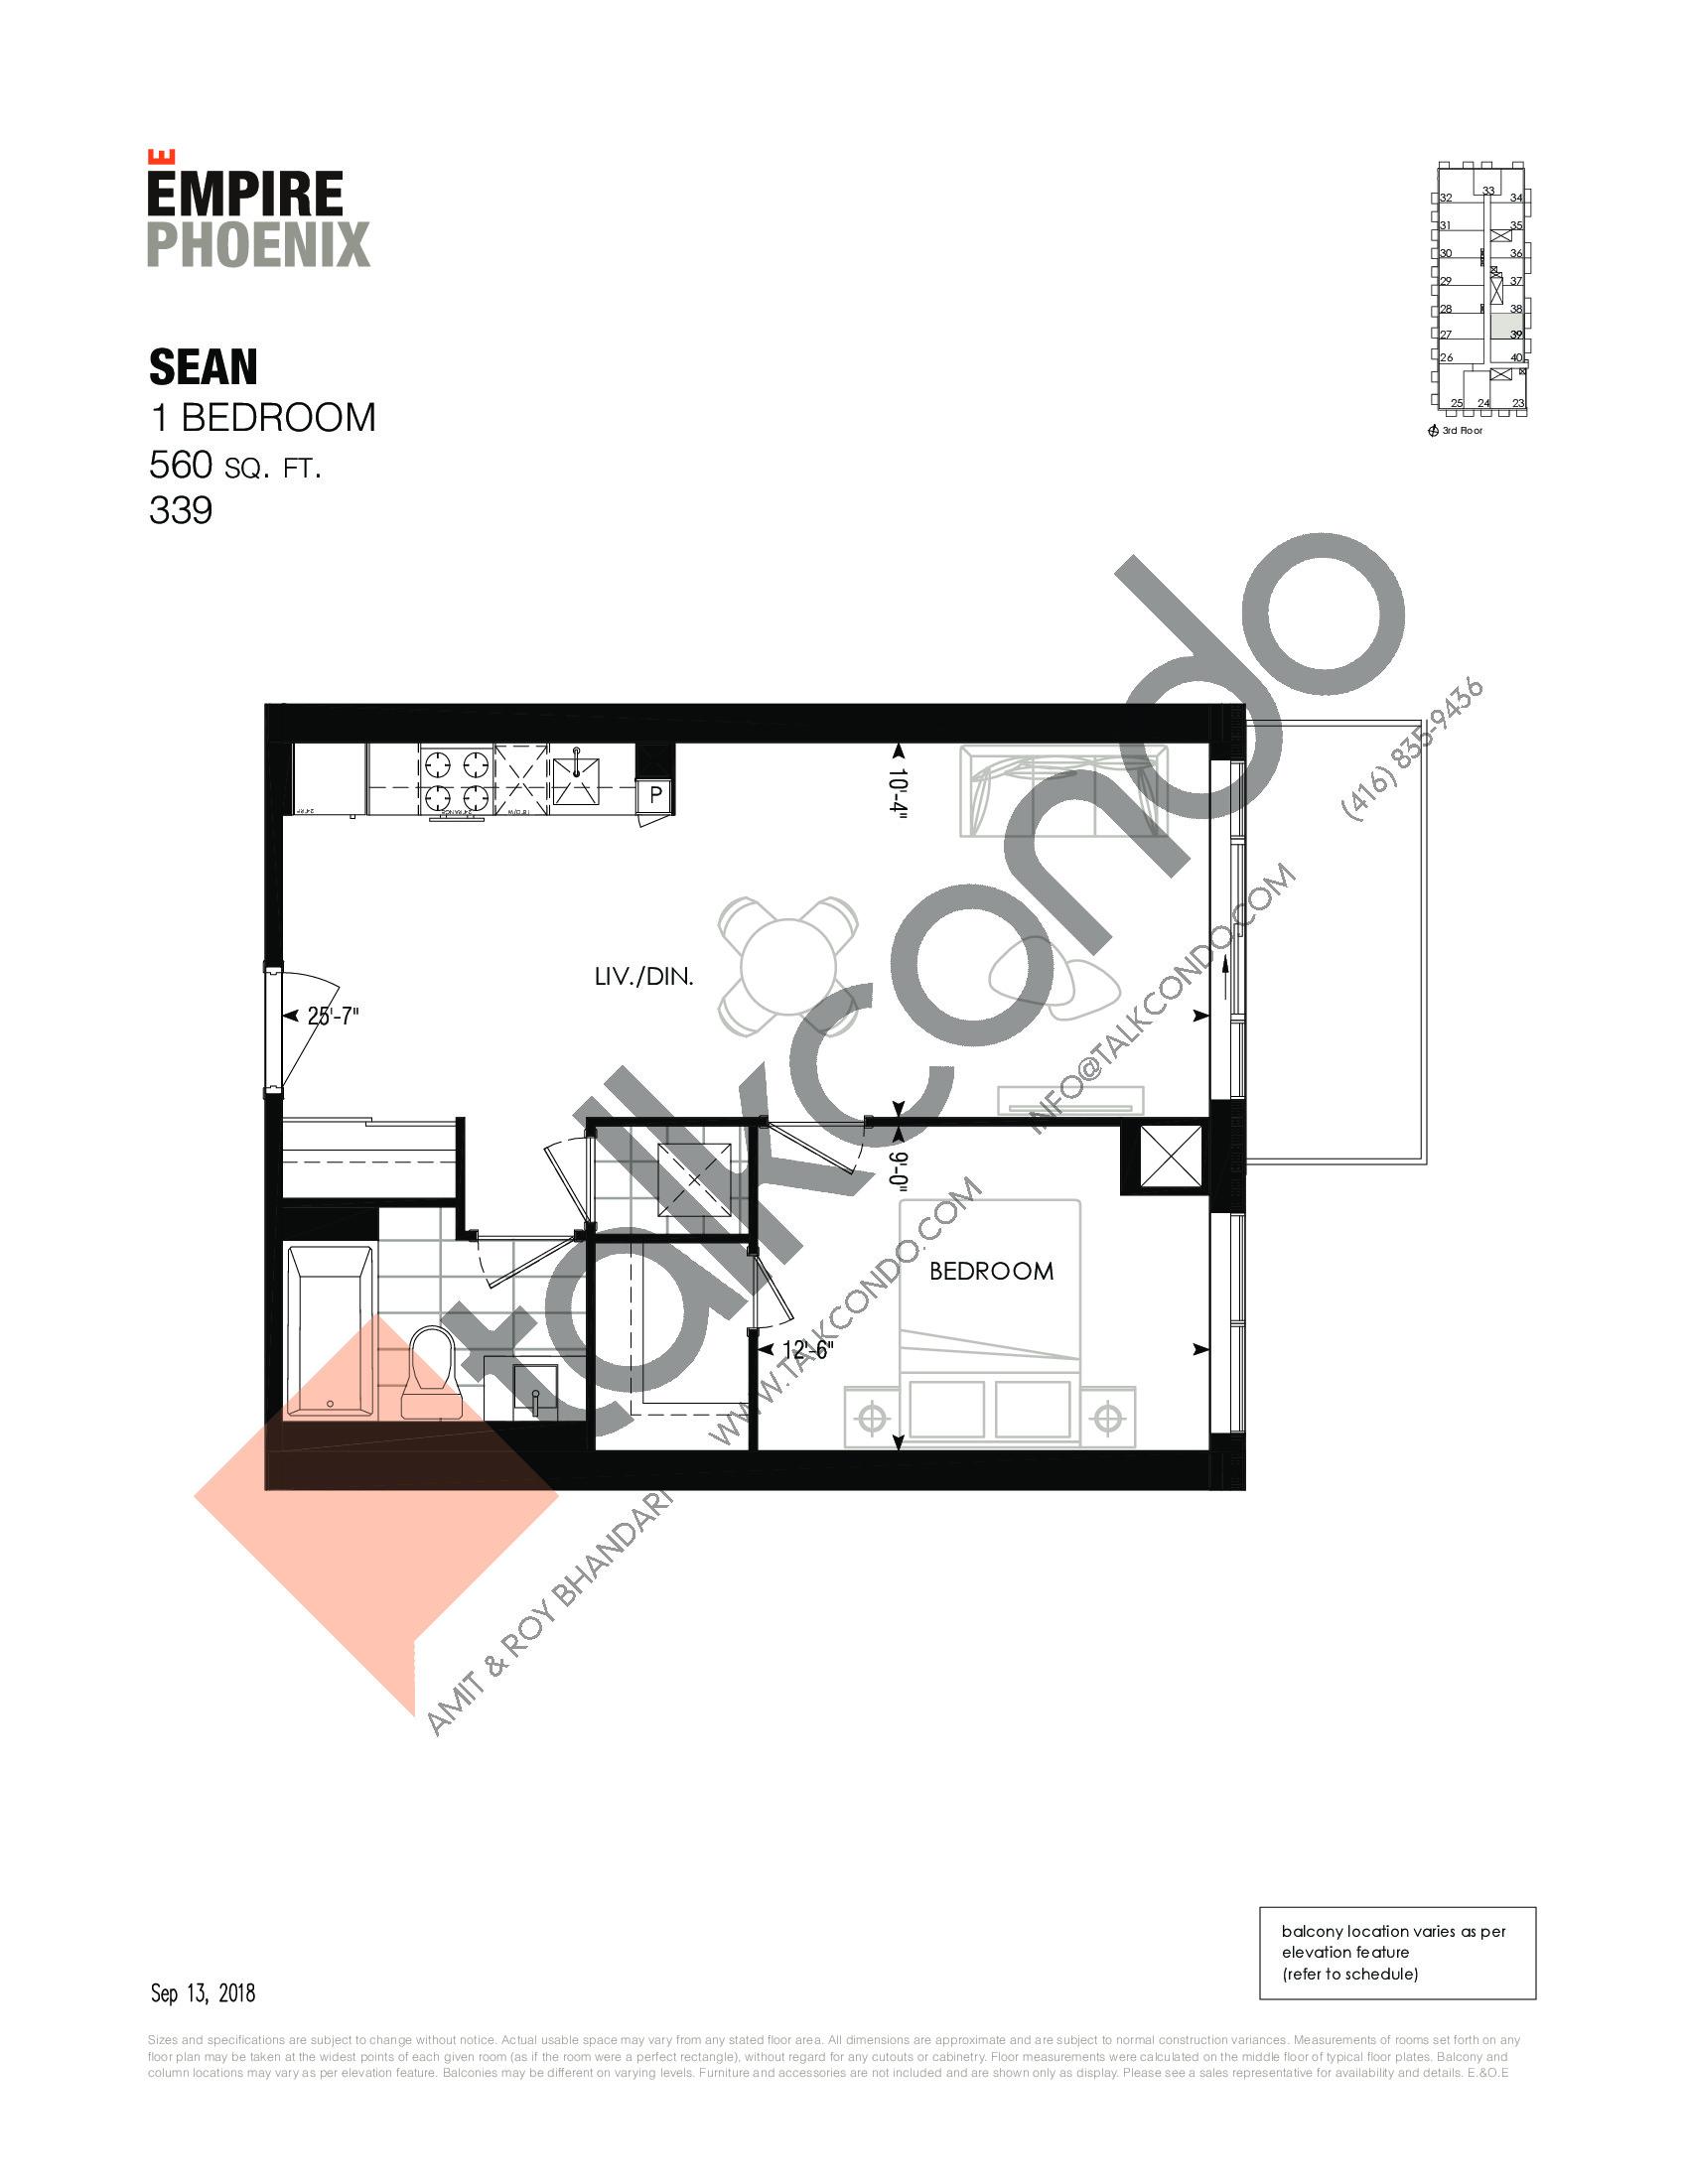 Sean Floor Plan at Empire Phoenix Phase 2 Condos - 560 sq.ft